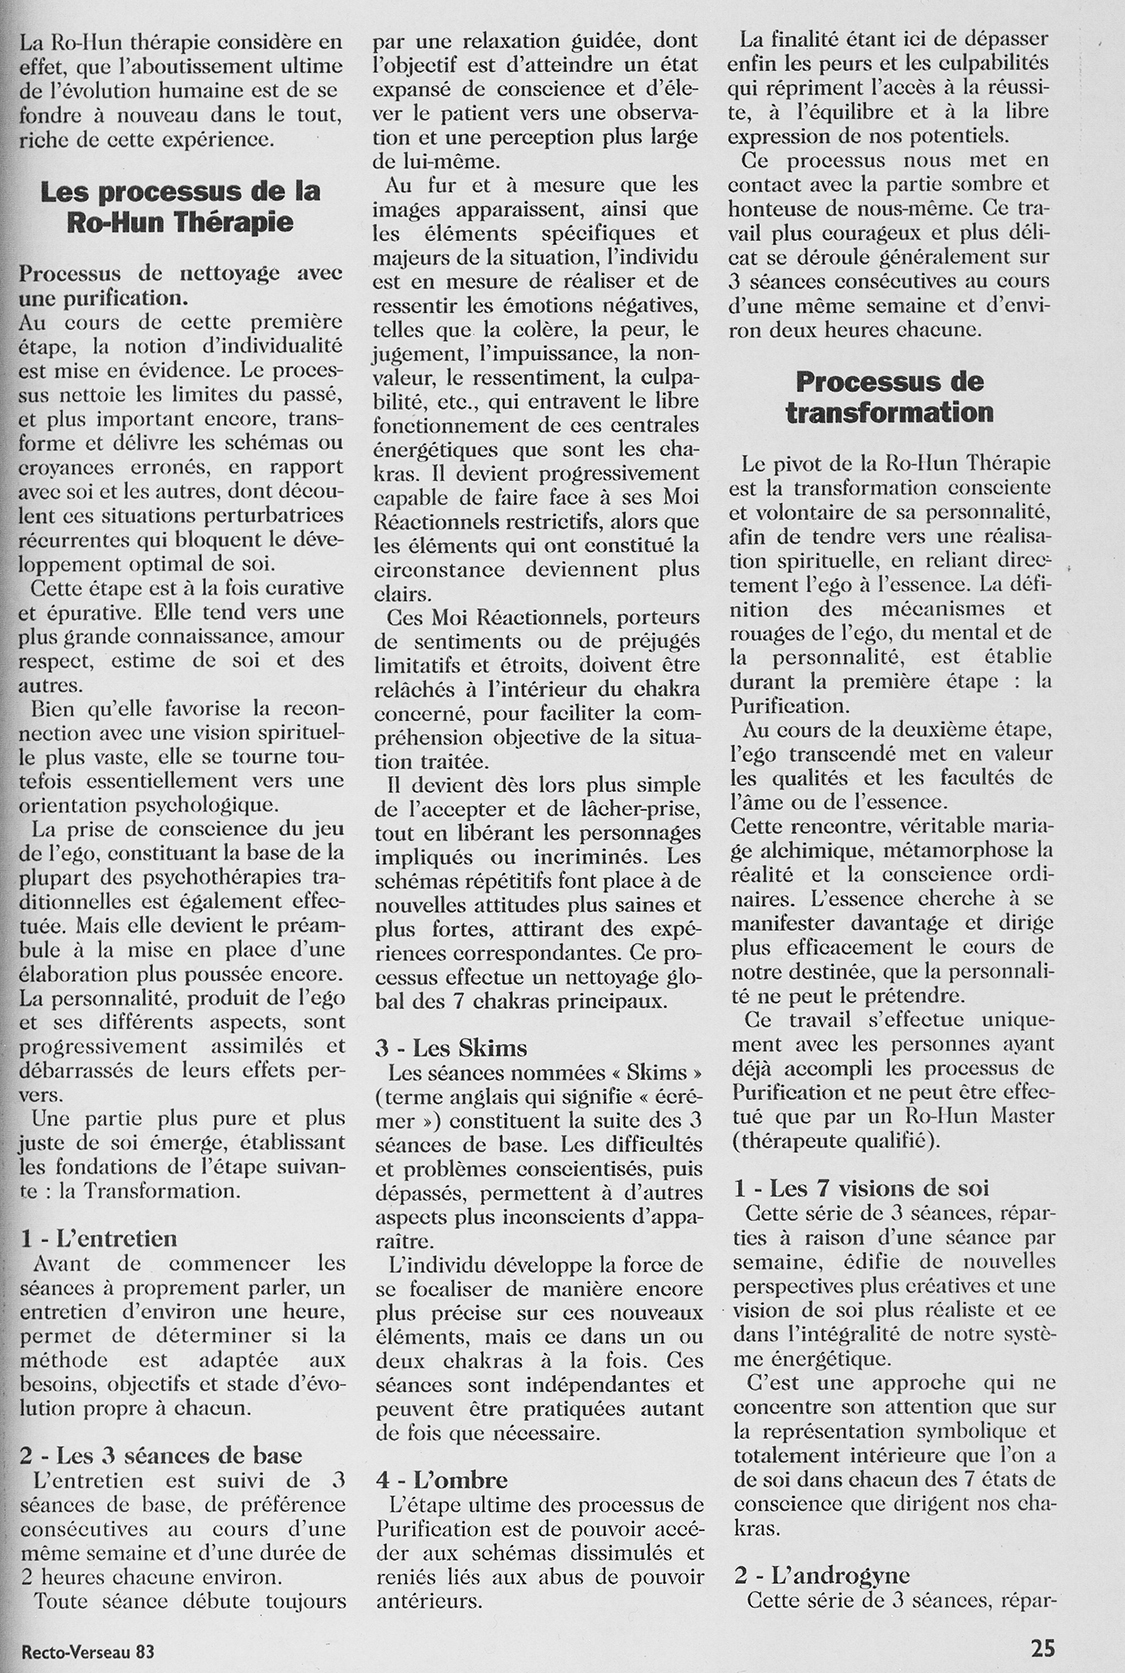 Rect-Verseau-3